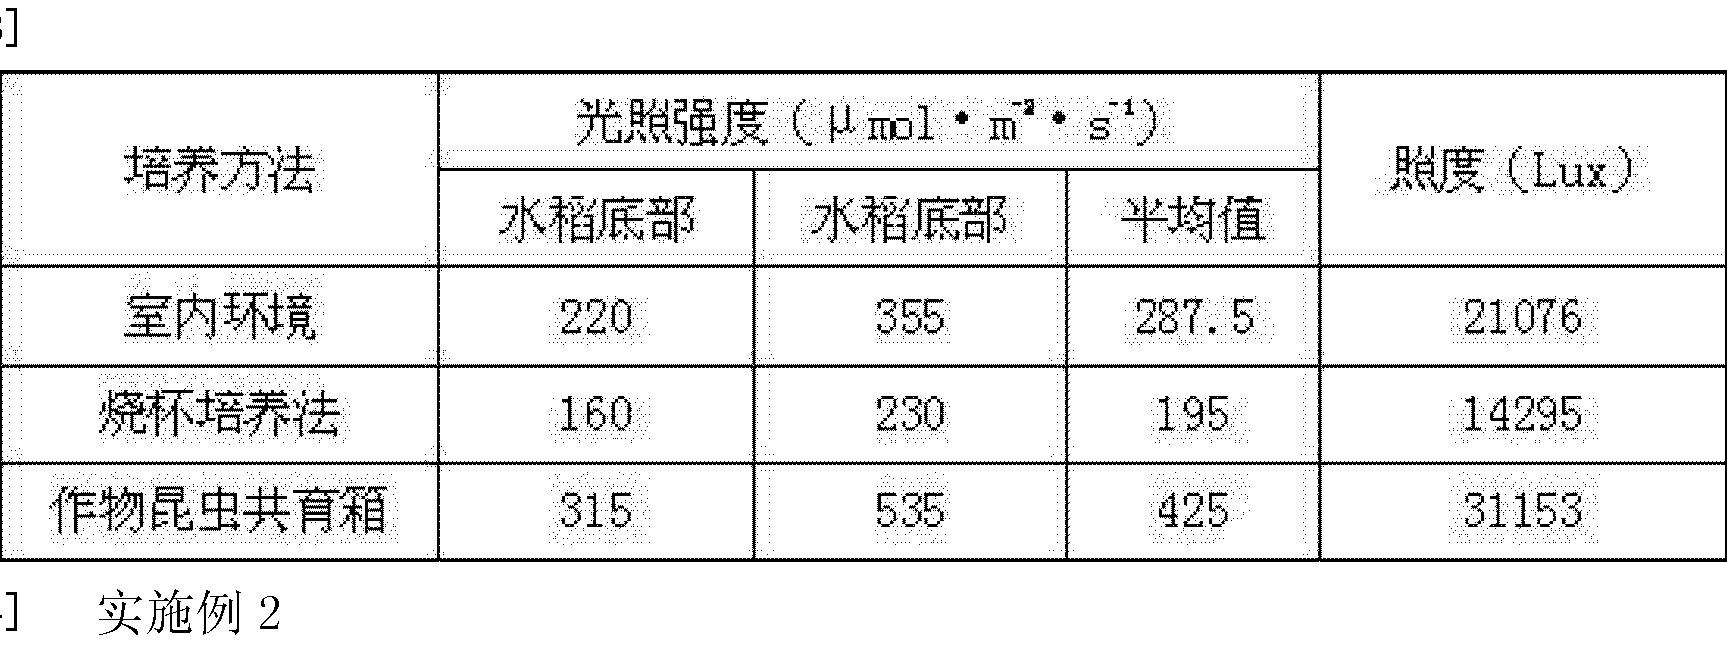 Figure CN202455937UD00061